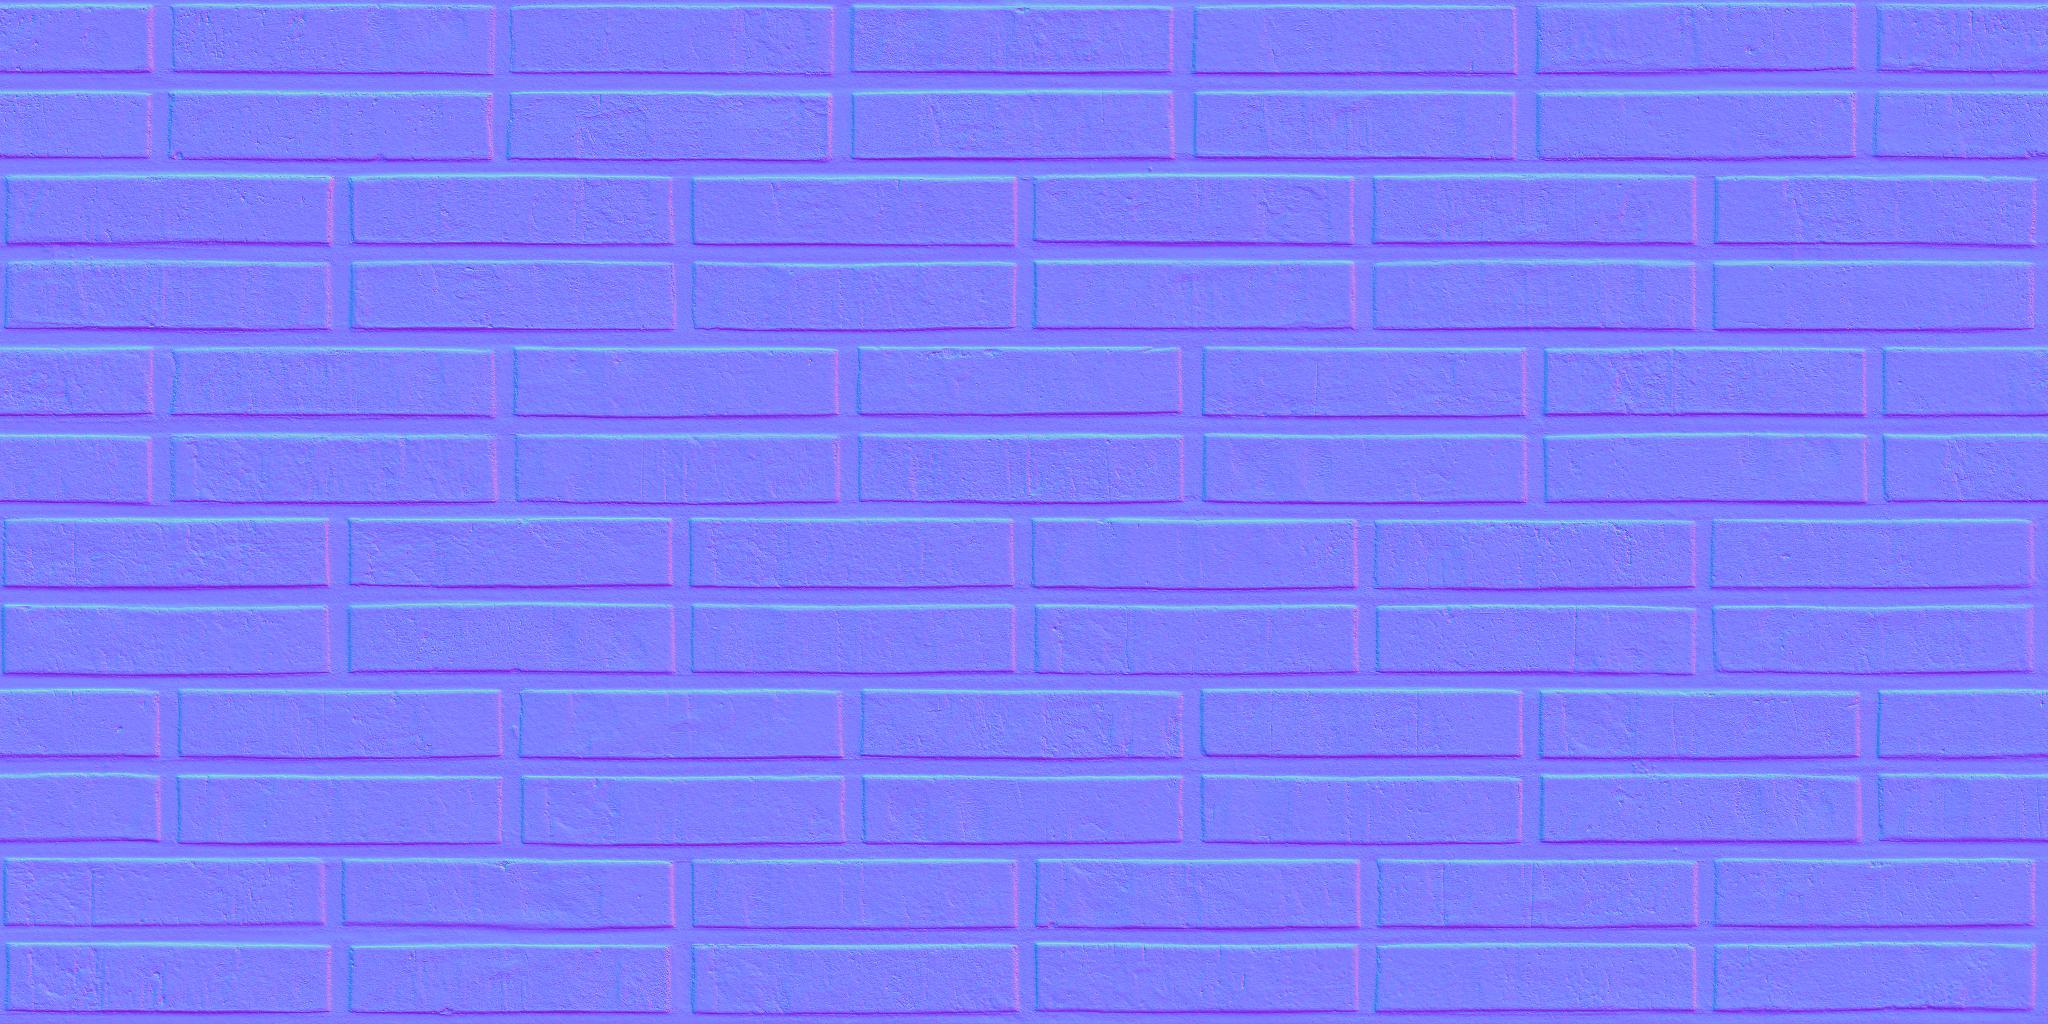 3D Scanned Seamless Brick Wall Dark Normal Map